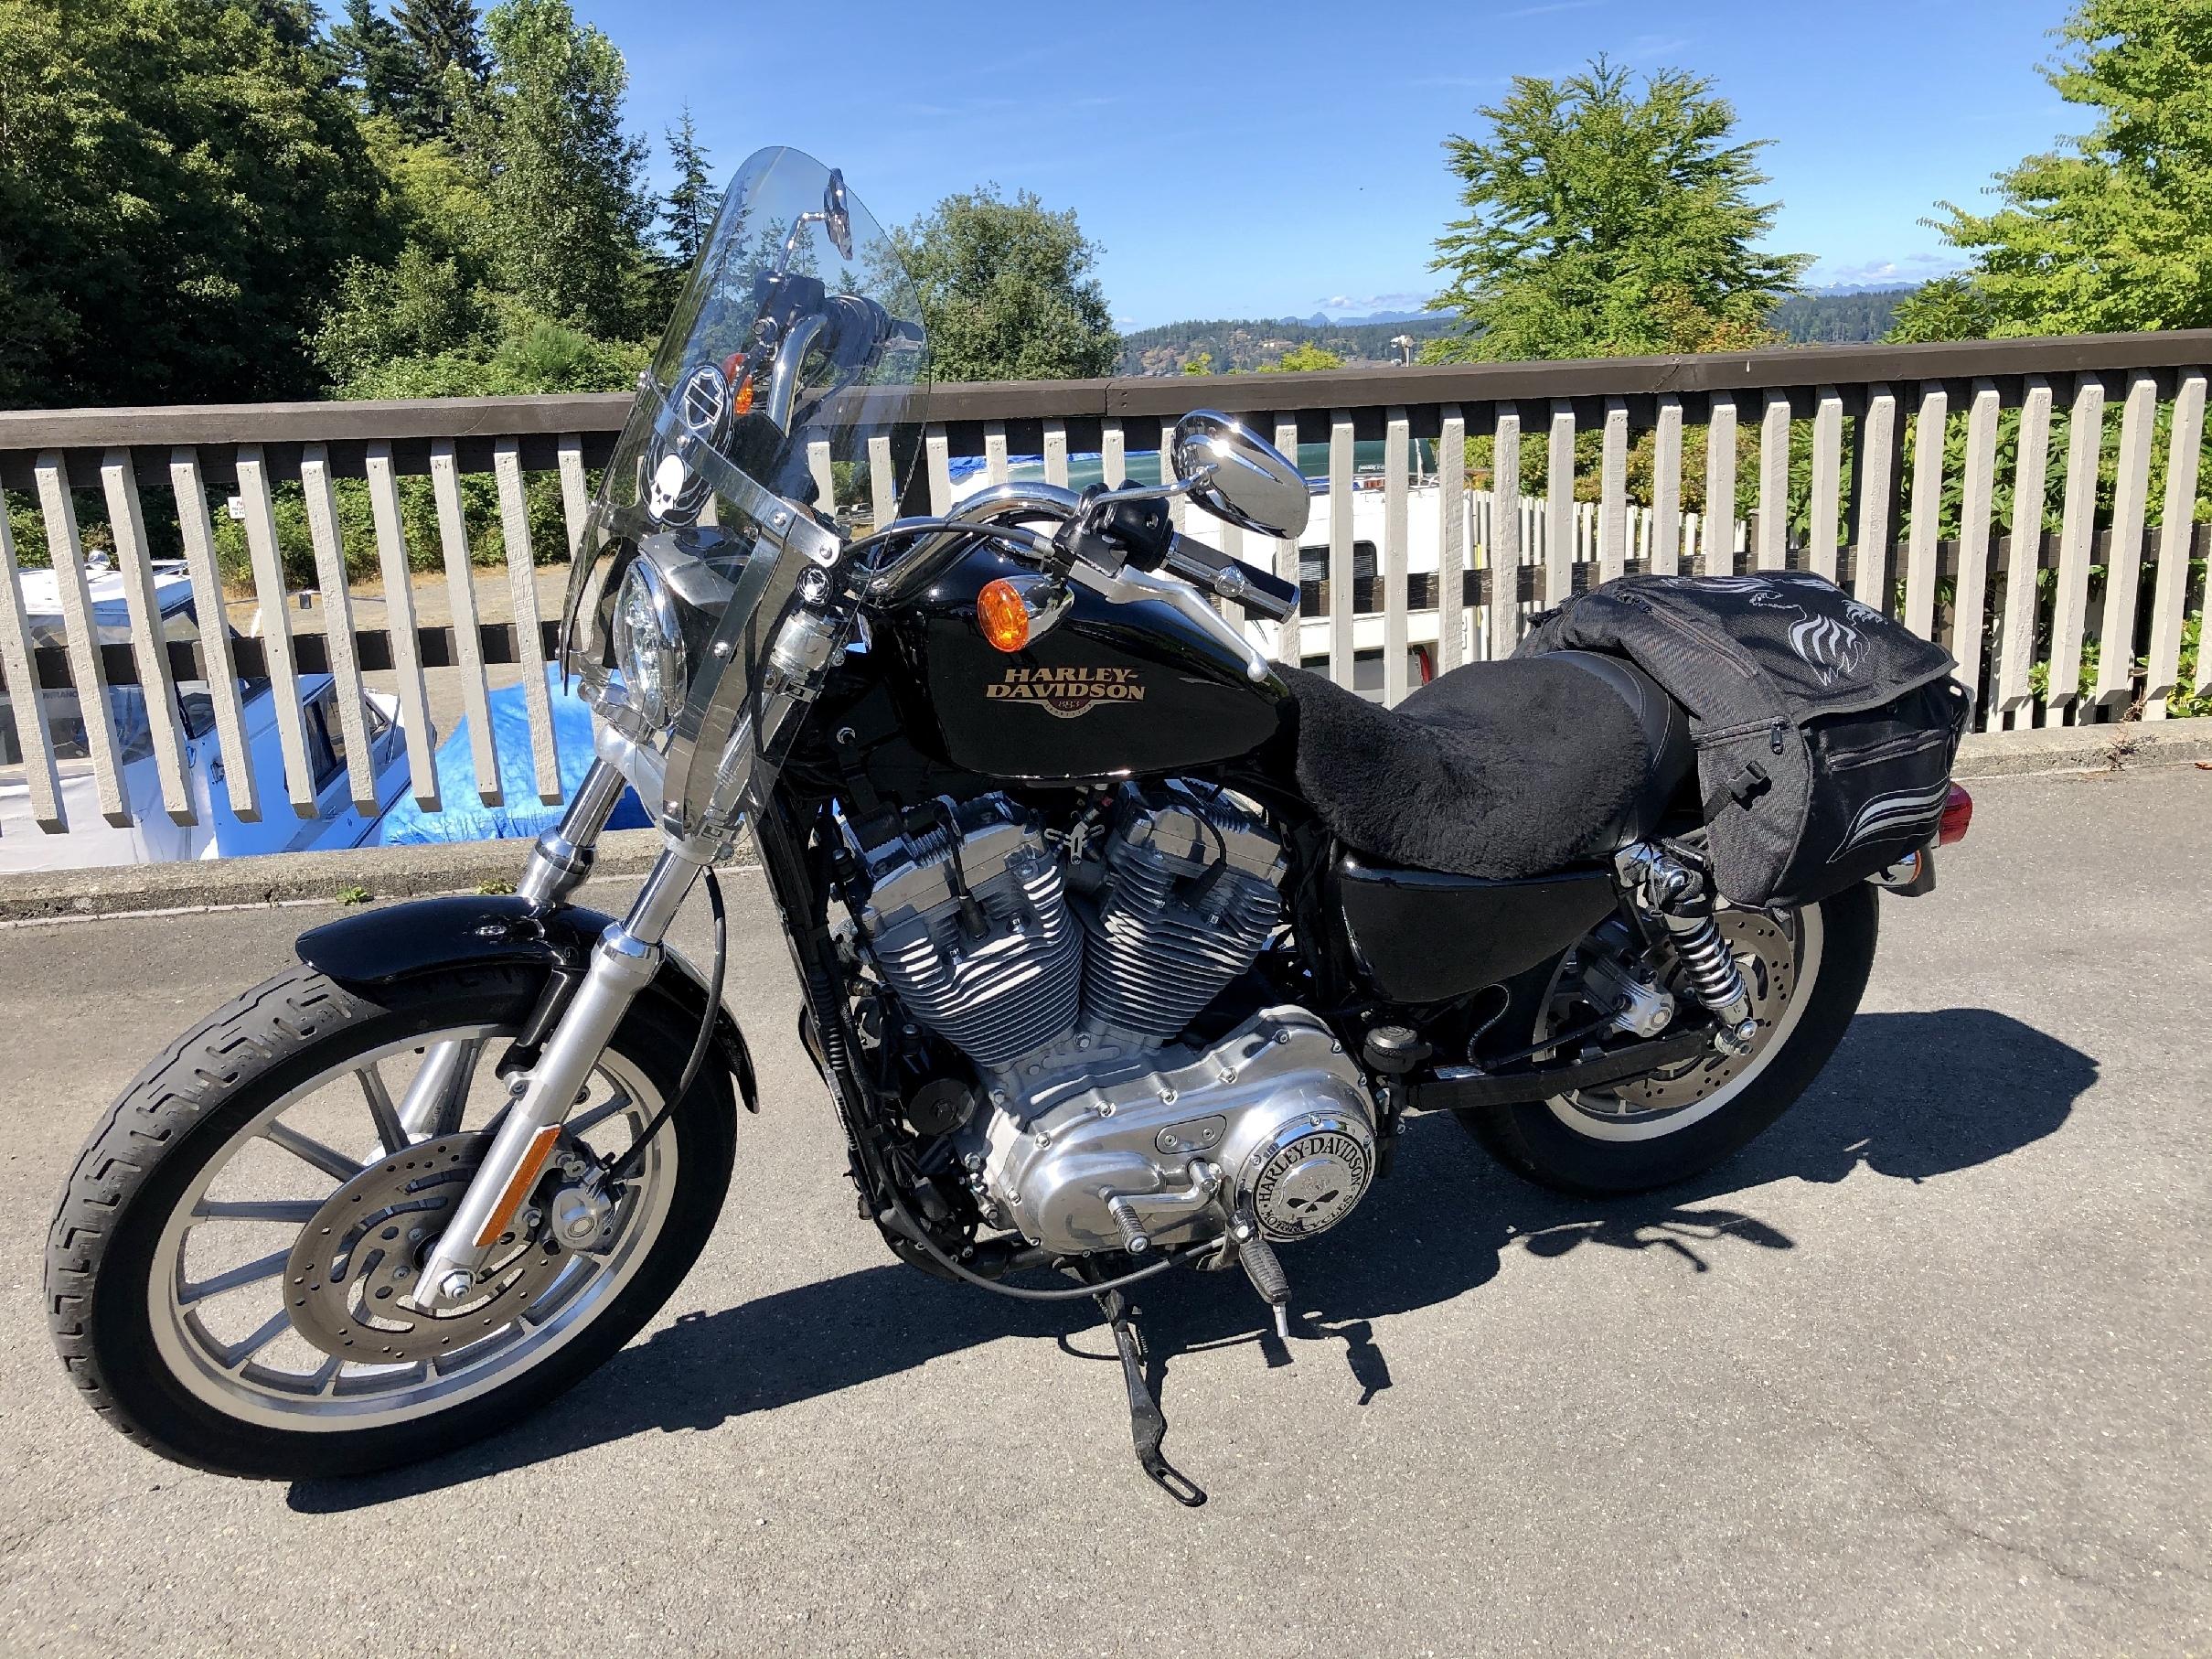 2009 Harley Davidson Sportster Xl883l Low Sportster Campbell River